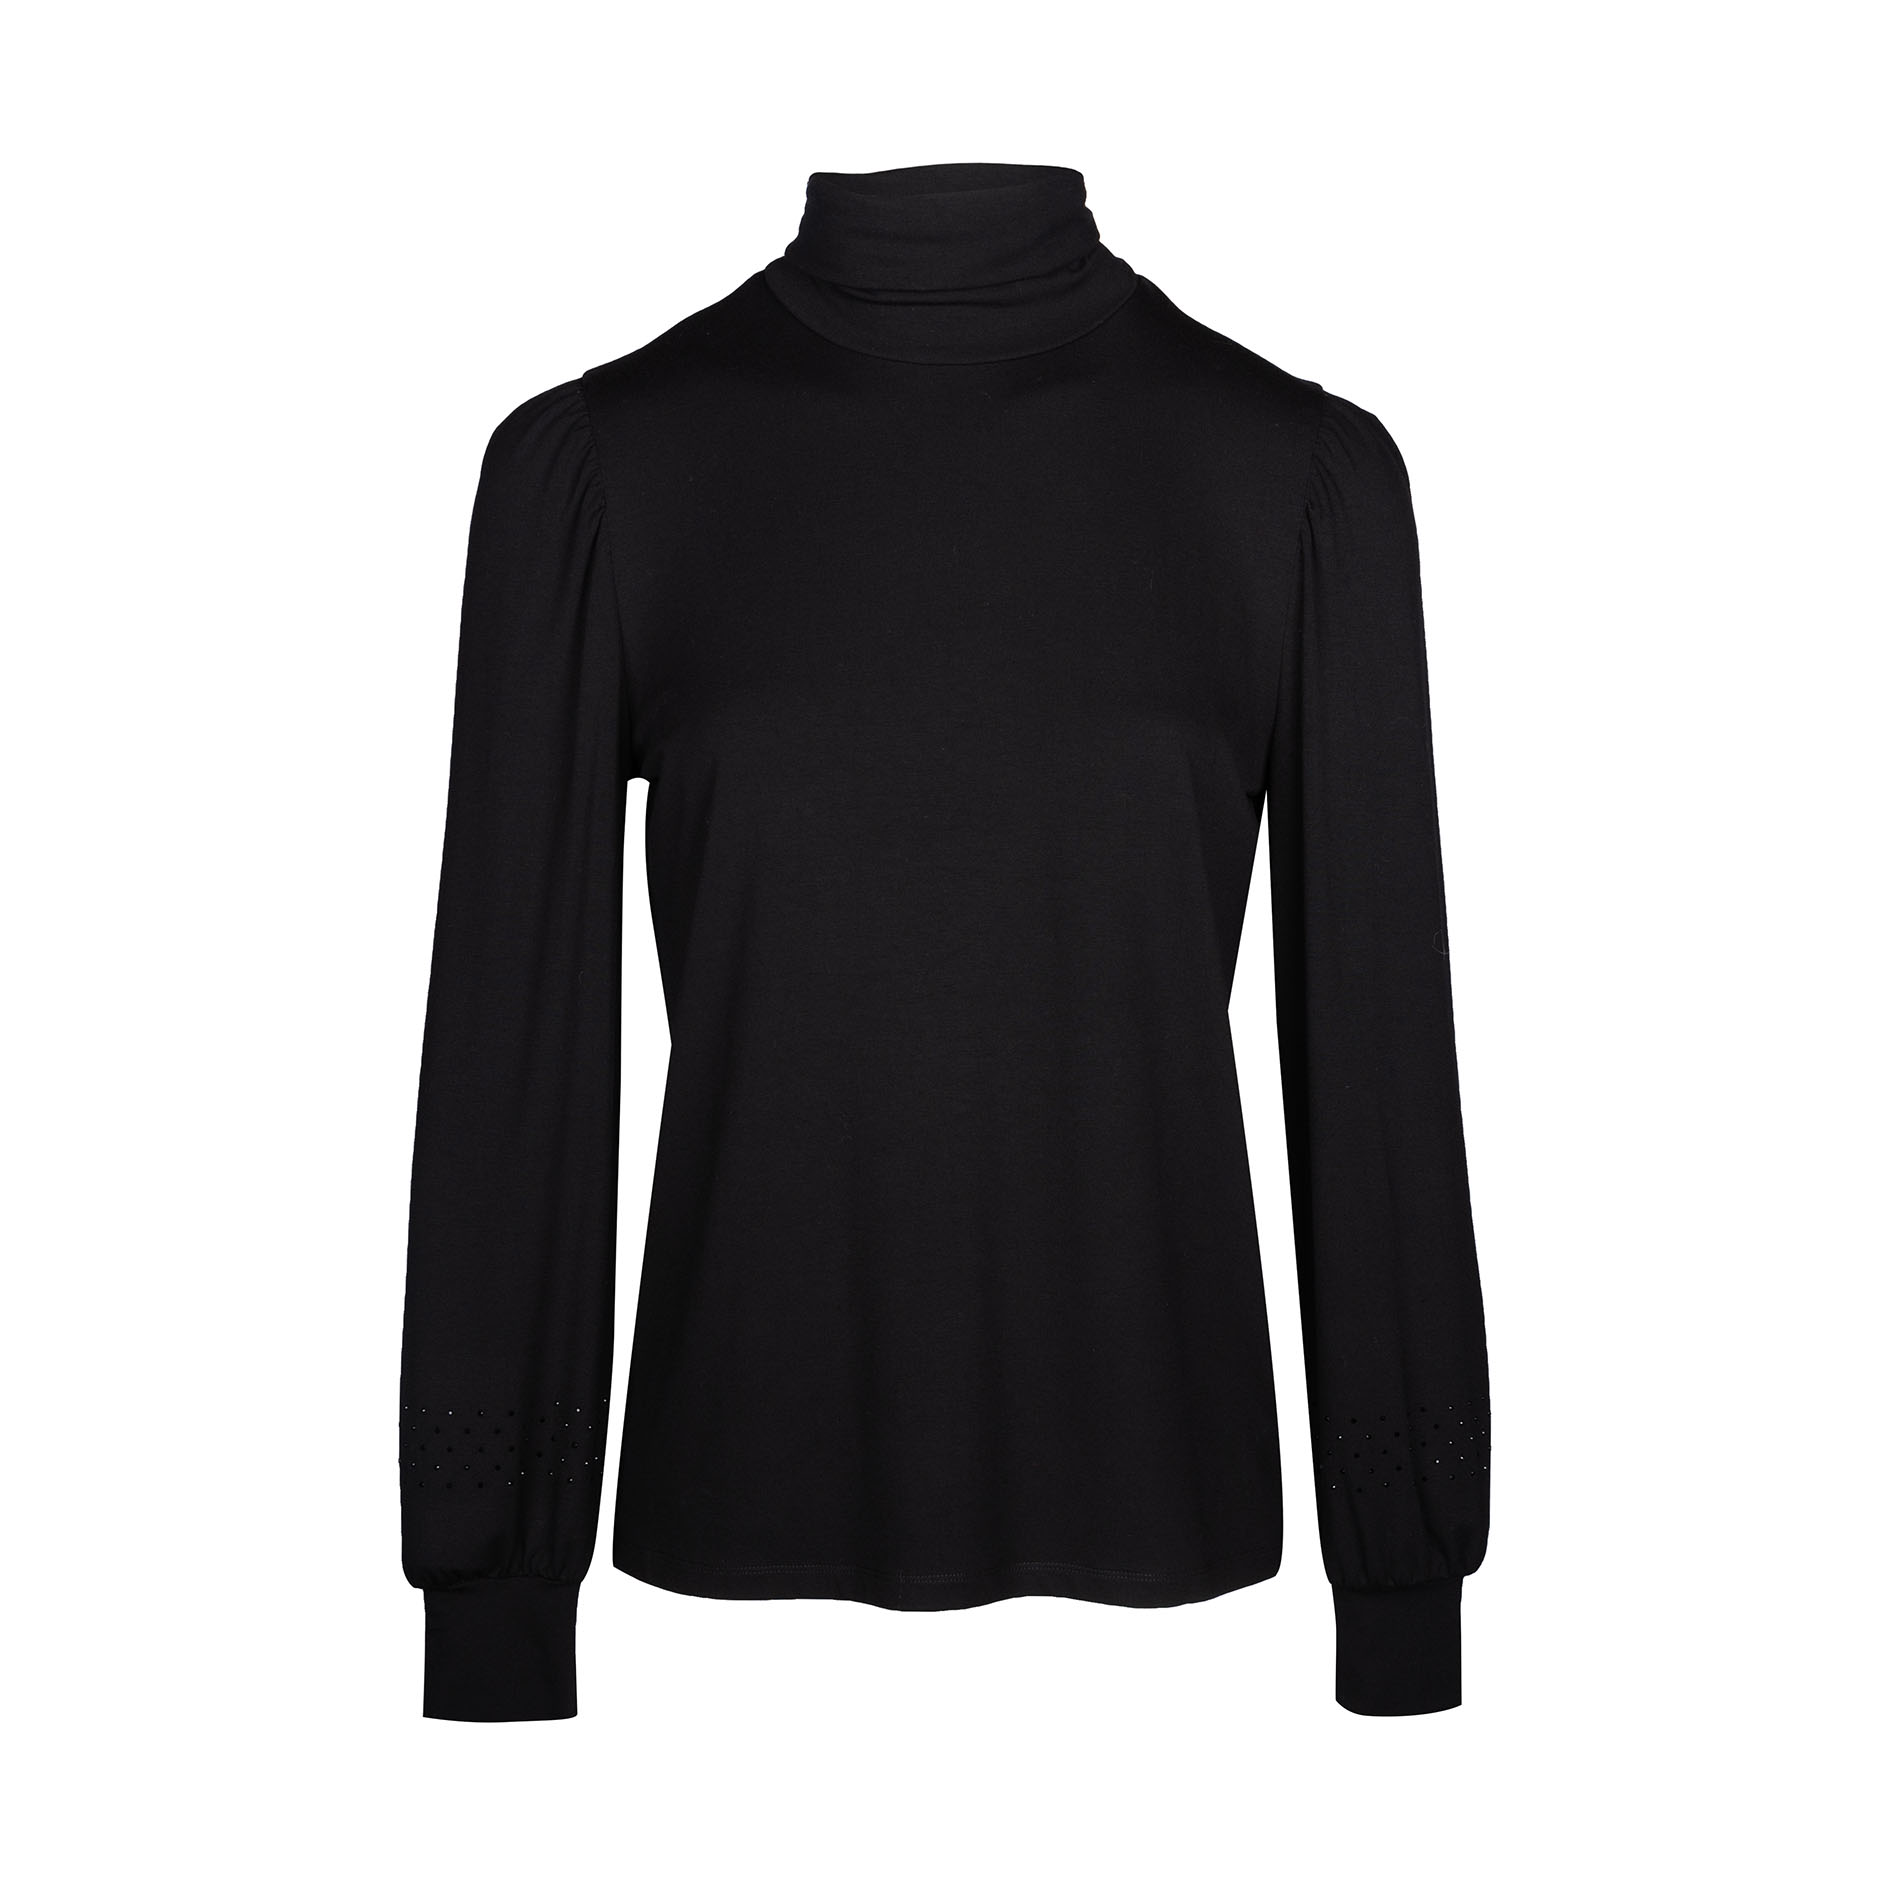 T-Shirt 'Prato' Black